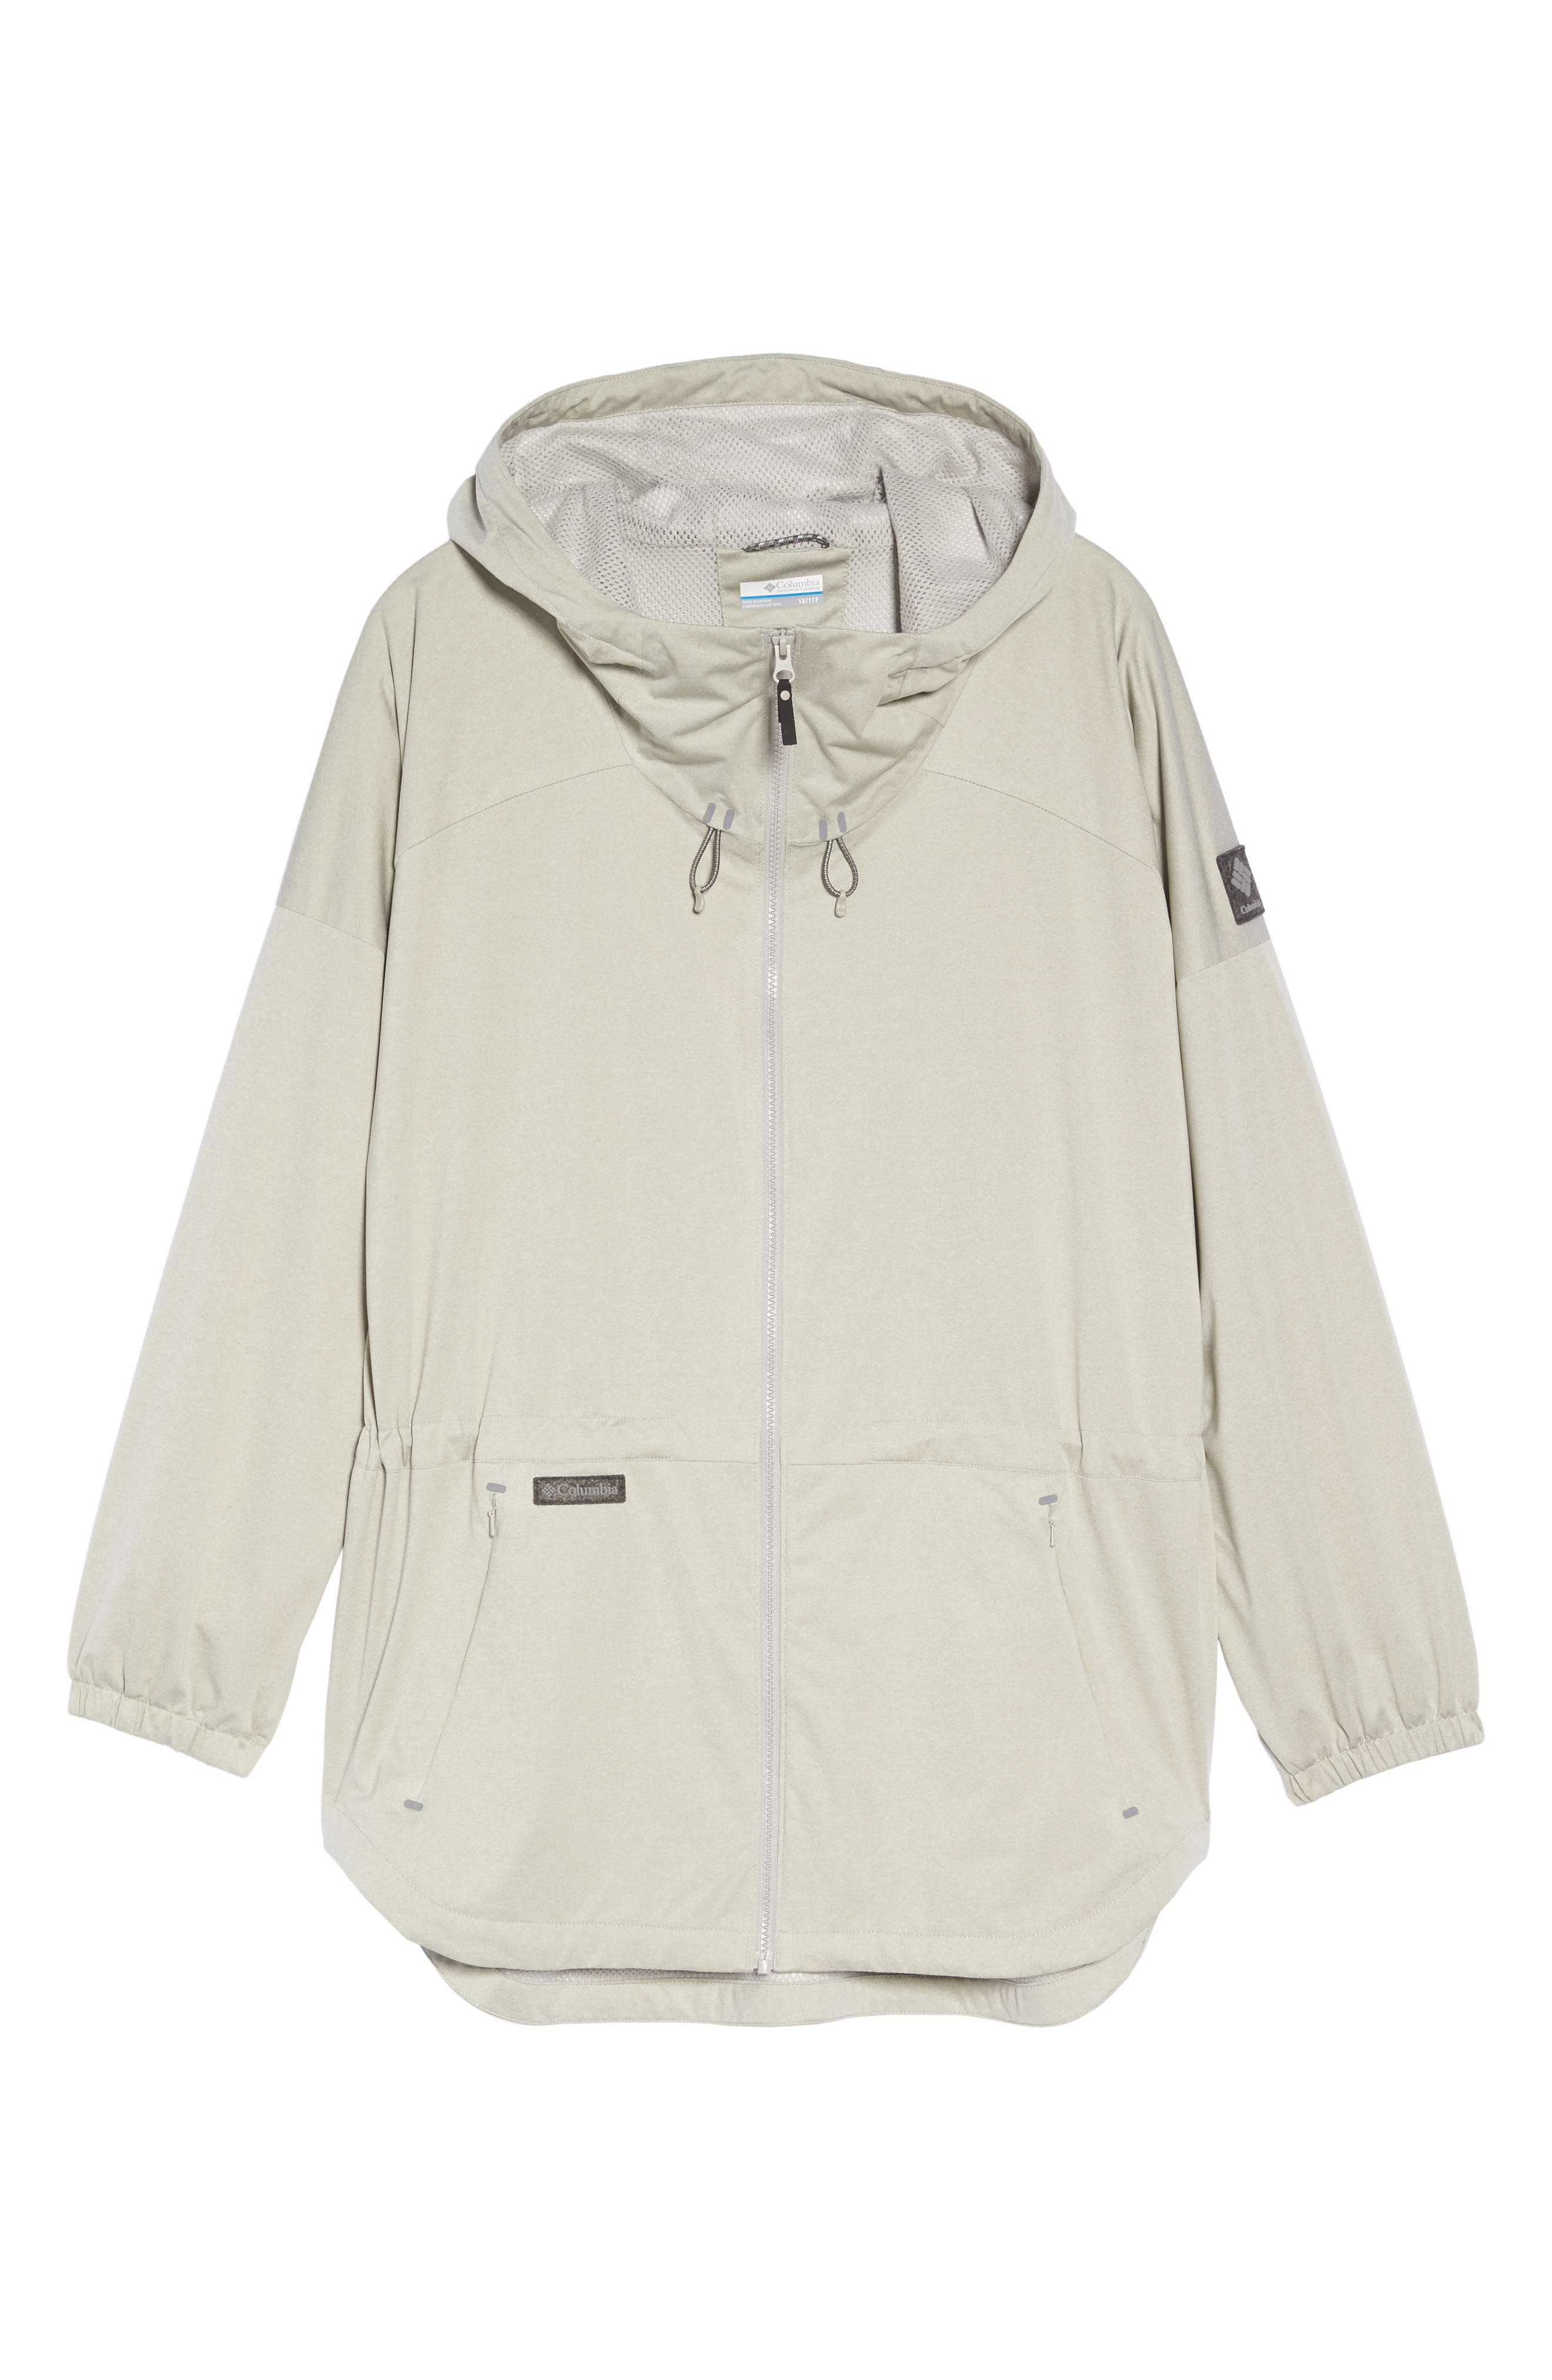 Northbounder Waterproof Hooded Jacket,                             Alternate thumbnail 5, color,